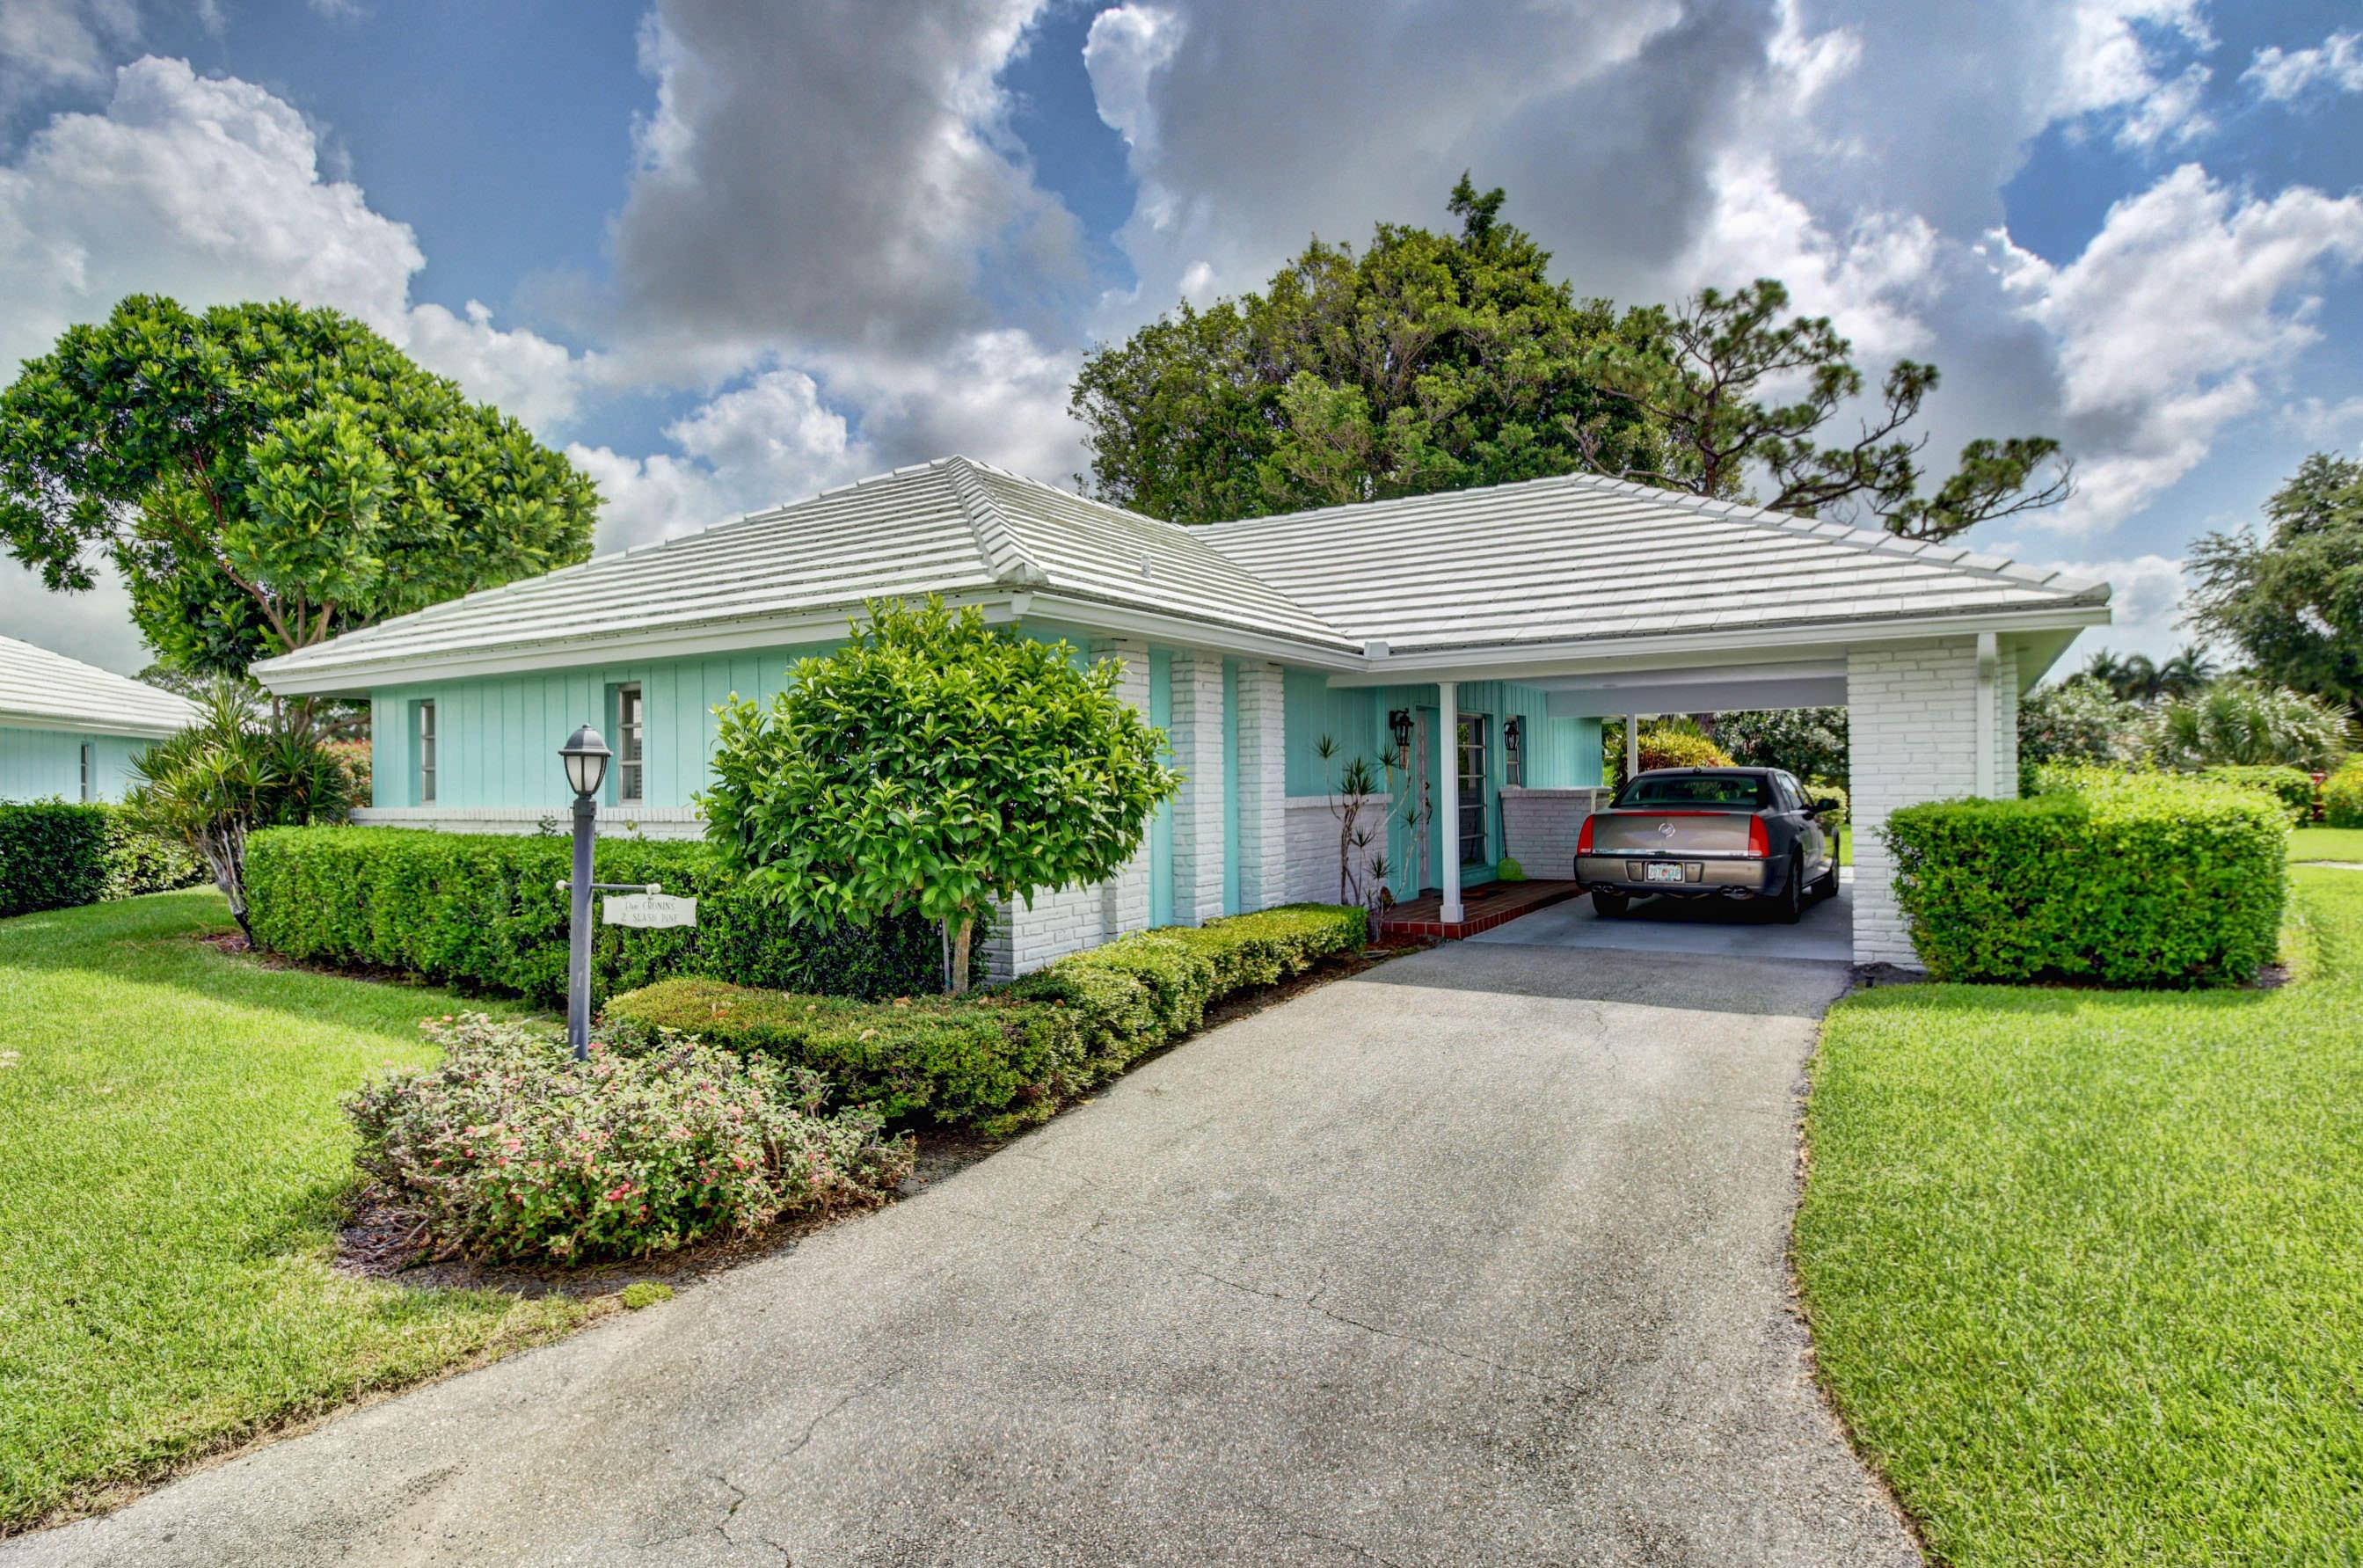 2 Slash Pine Drive 2 Boynton Beach, FL 33436